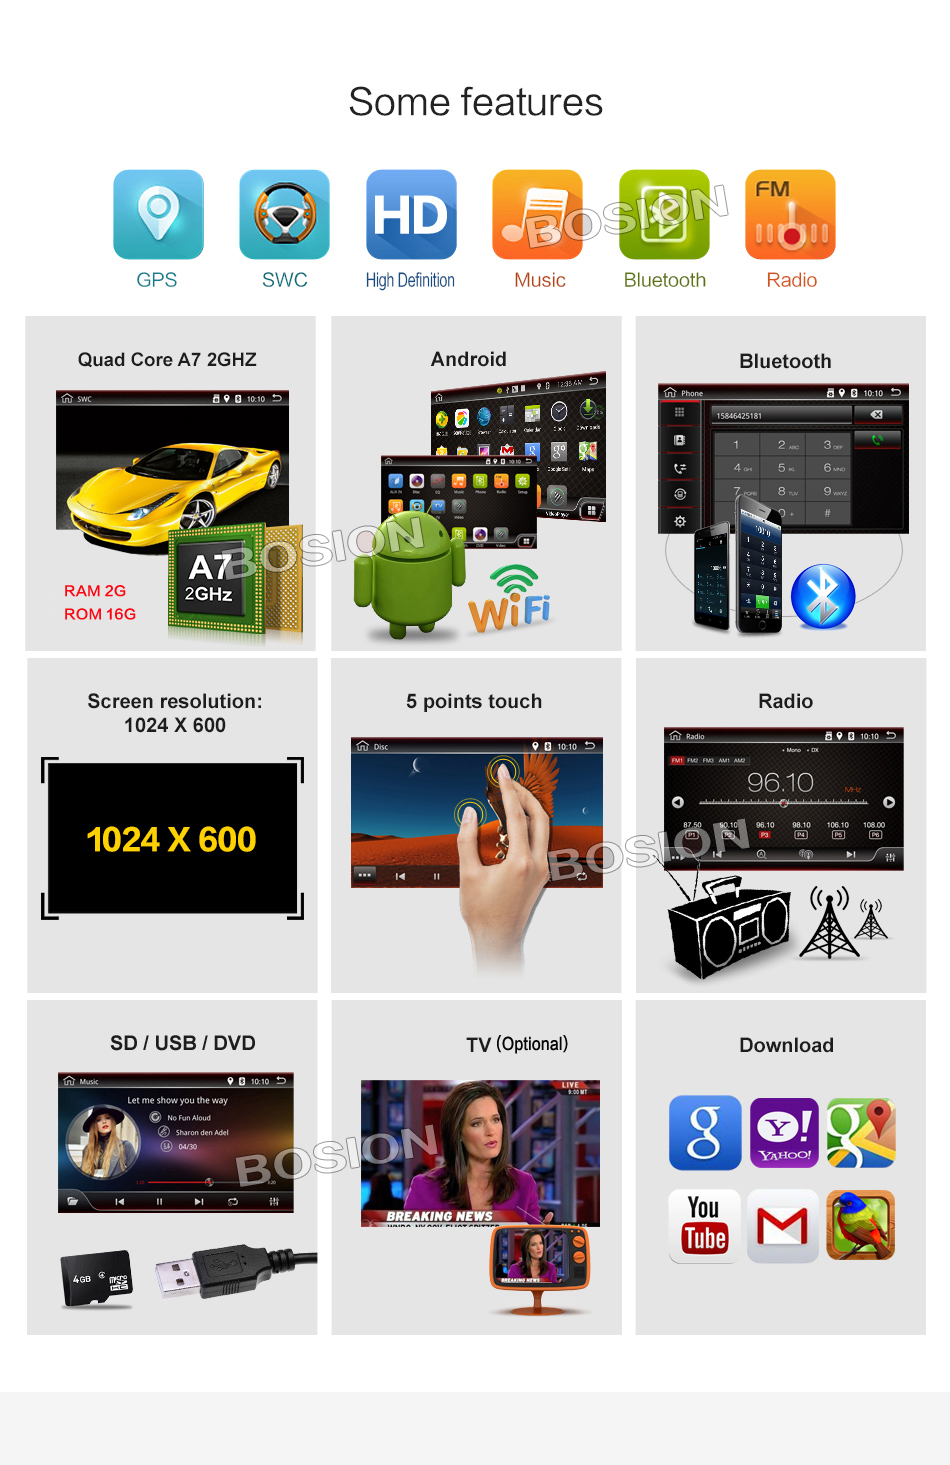 2 Din 8 inch Quad core Android 6.0 vw car dvd for Polo Jetta Tiguan passat b6 cc fabia mirror link wifi Radio CD in dash